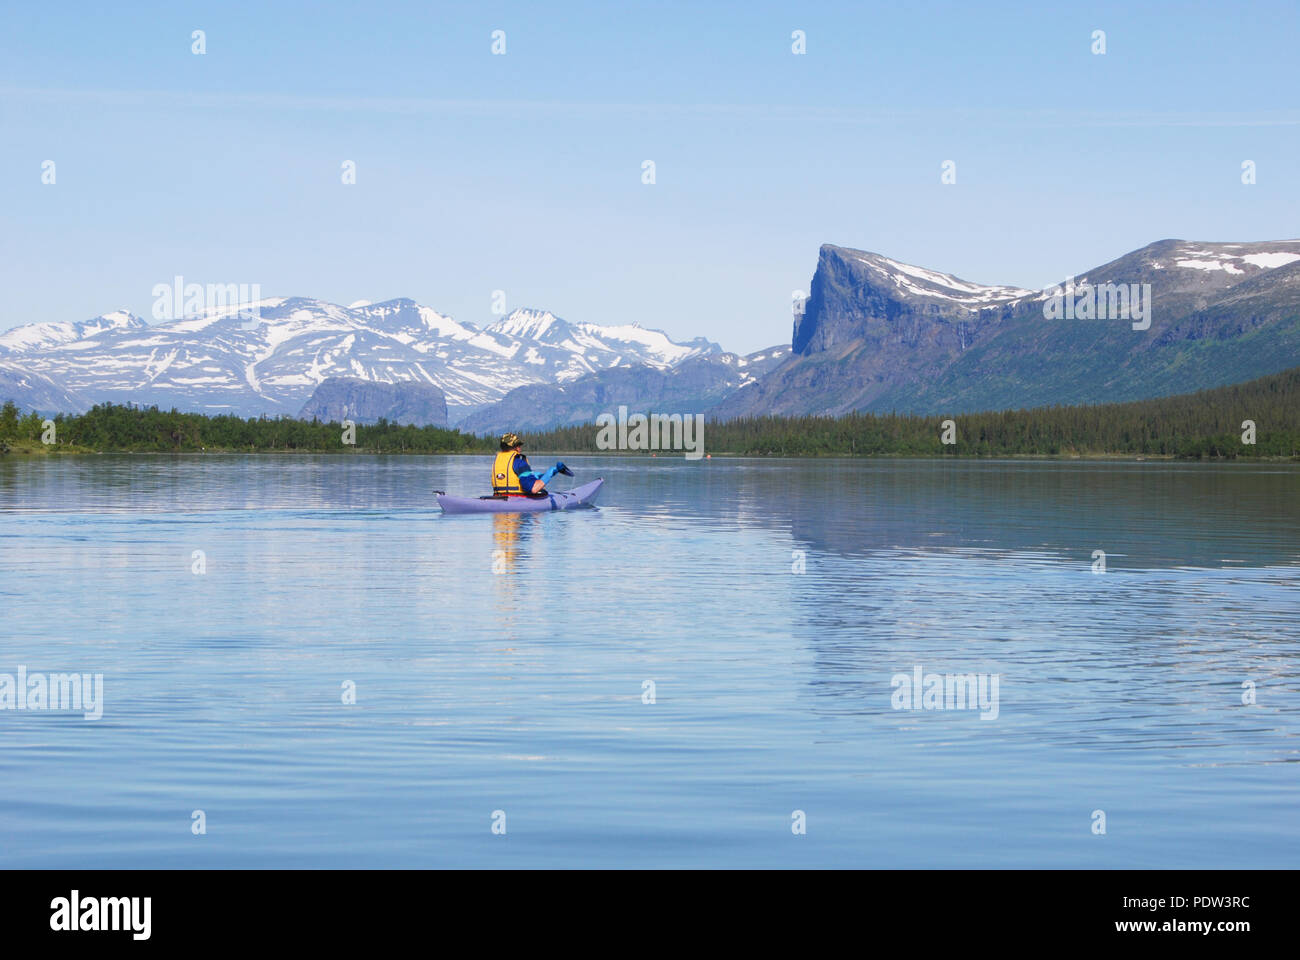 The beauty of Laponia Wilderness - Paddling Lake Laitaure - Stock Image